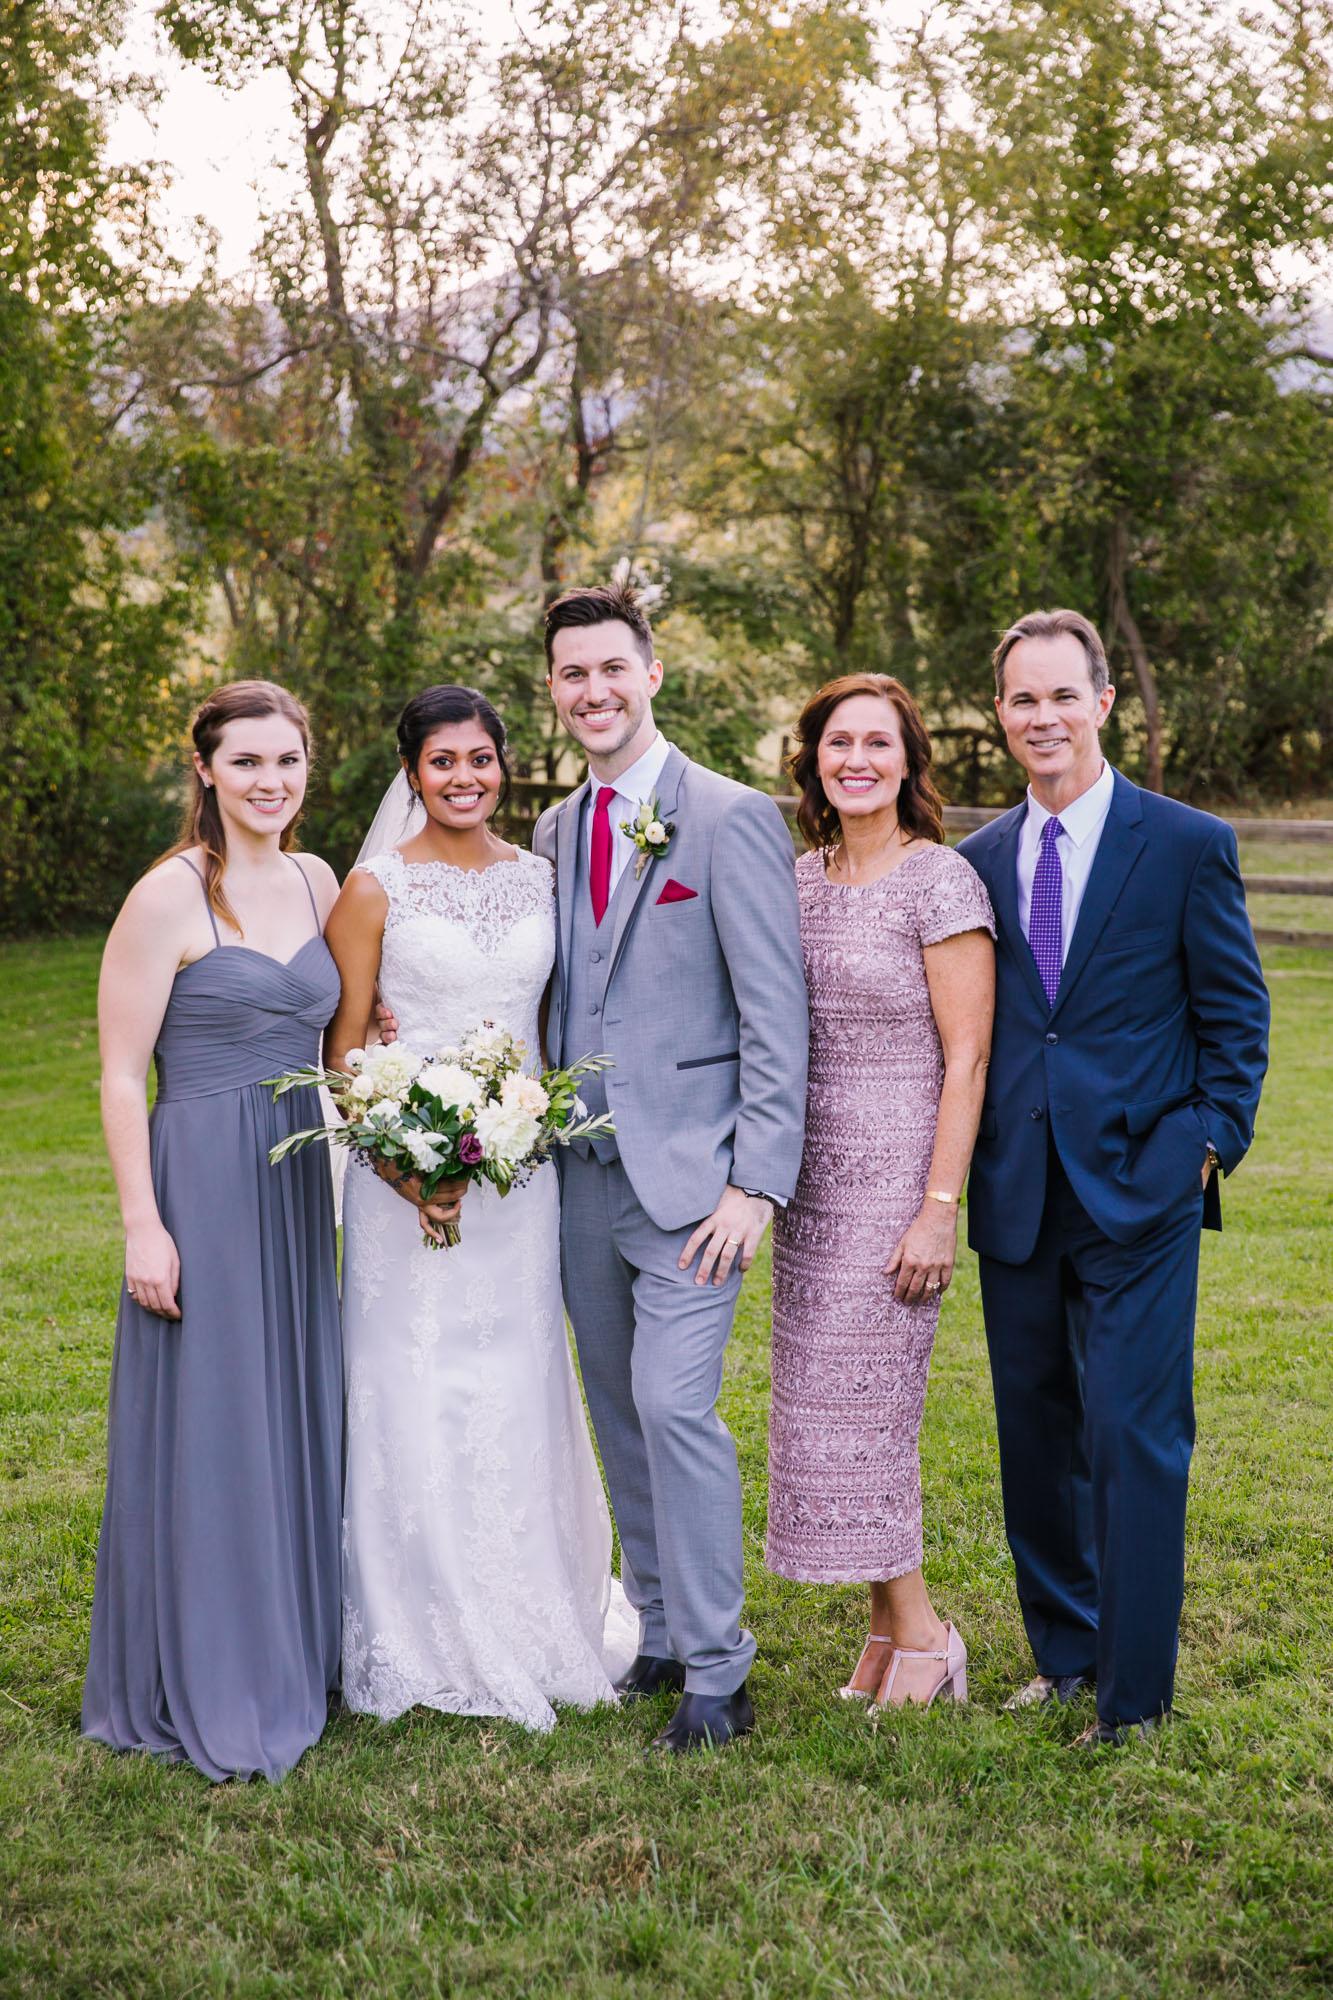 Waynesville NC Wedding Photography | Wedding Family Portrait